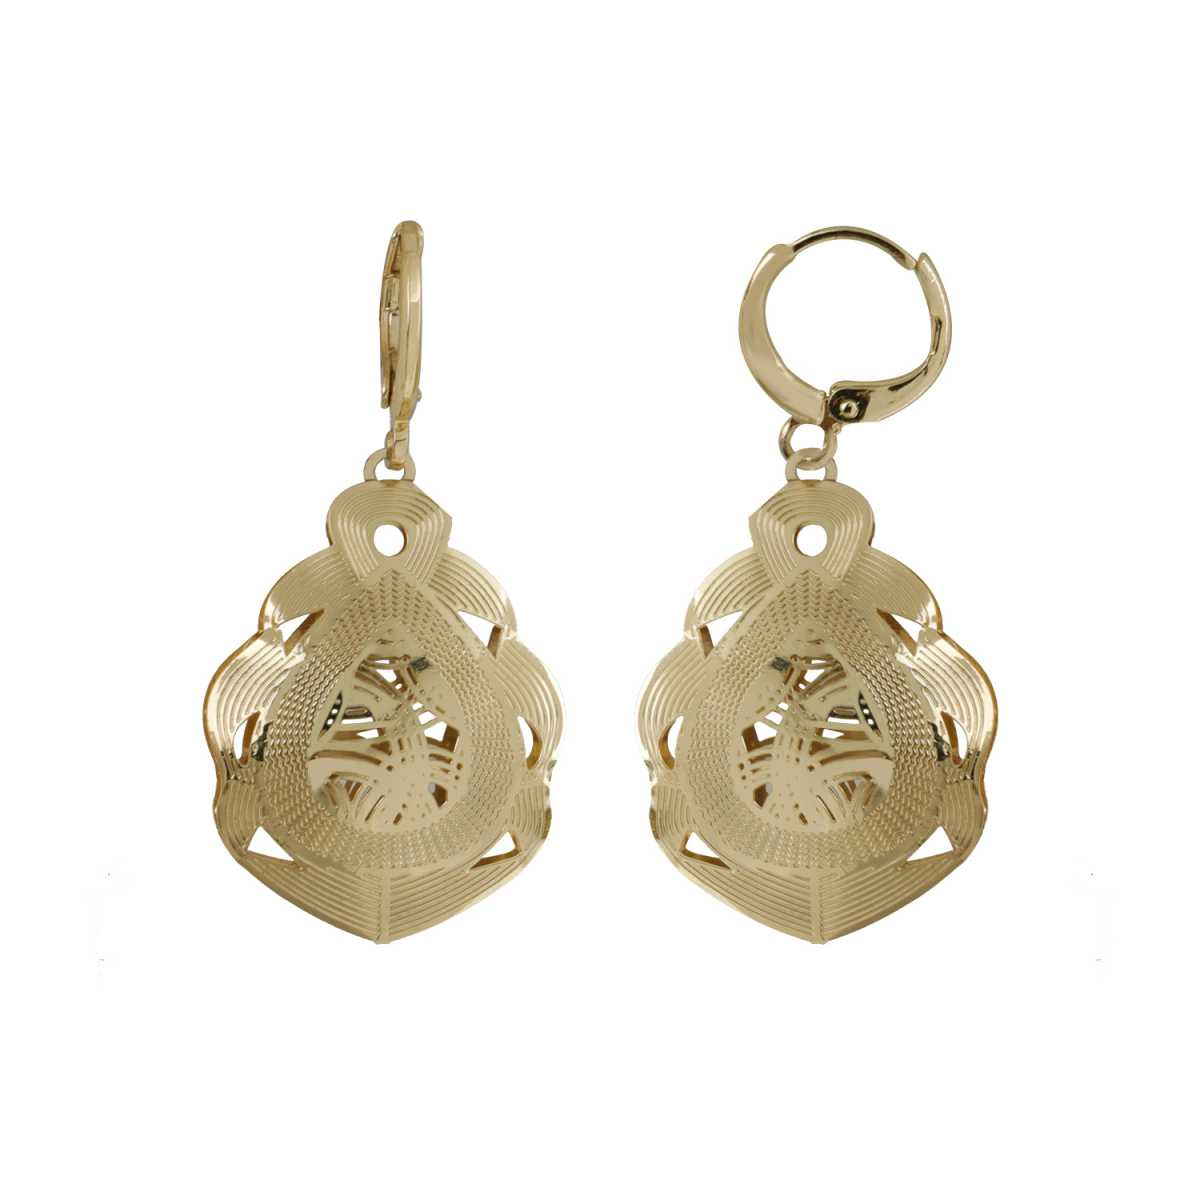 Silver Shine Good Looking Golden Leaf Shape Clip On Bali Earring for Women